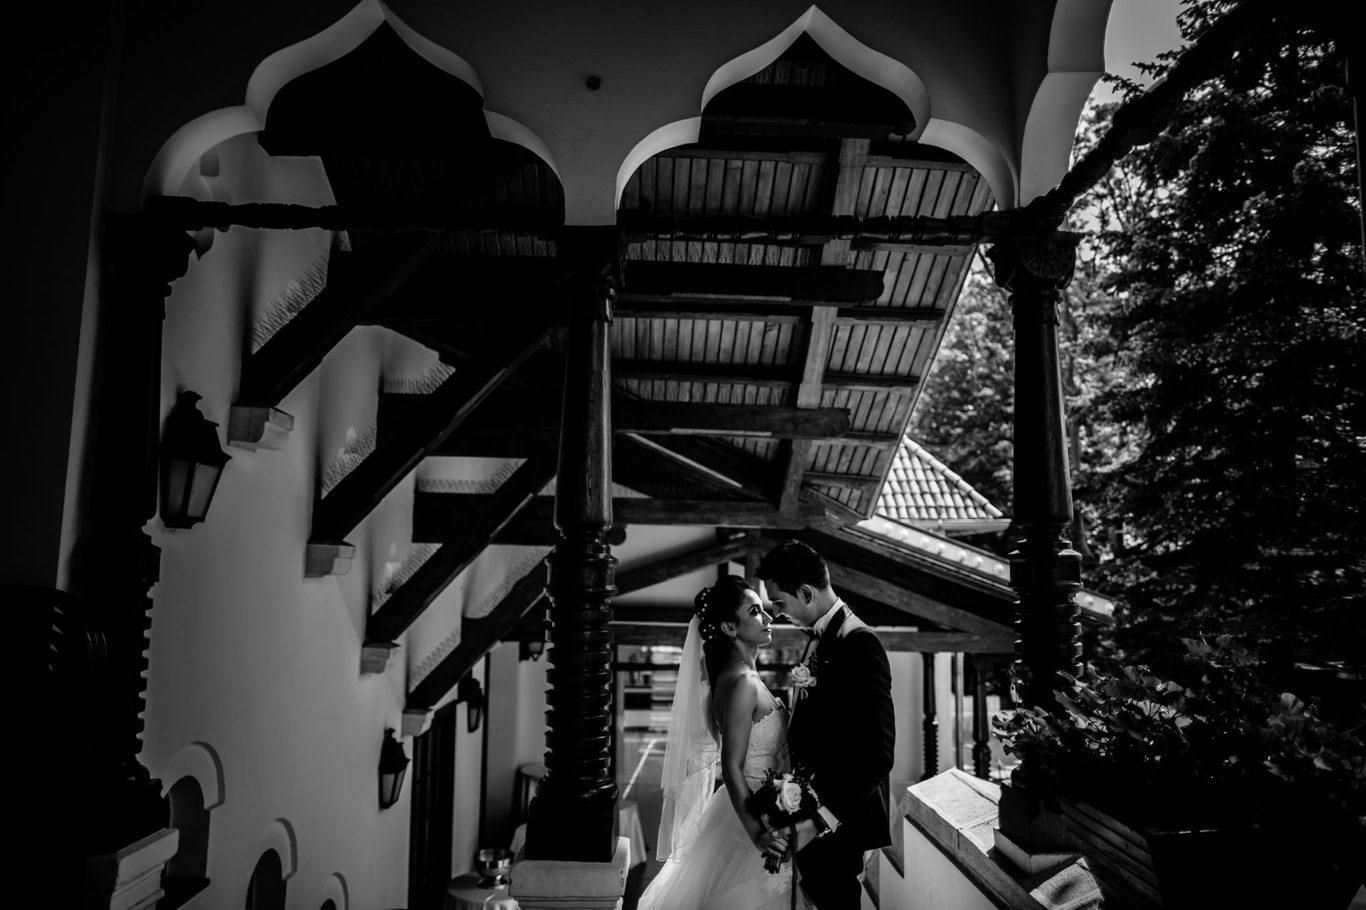 0202-fotografie-nunta-bucuresti-cristina-nicusor-fotograf-ciprian-dumitrescu-dc1_0024